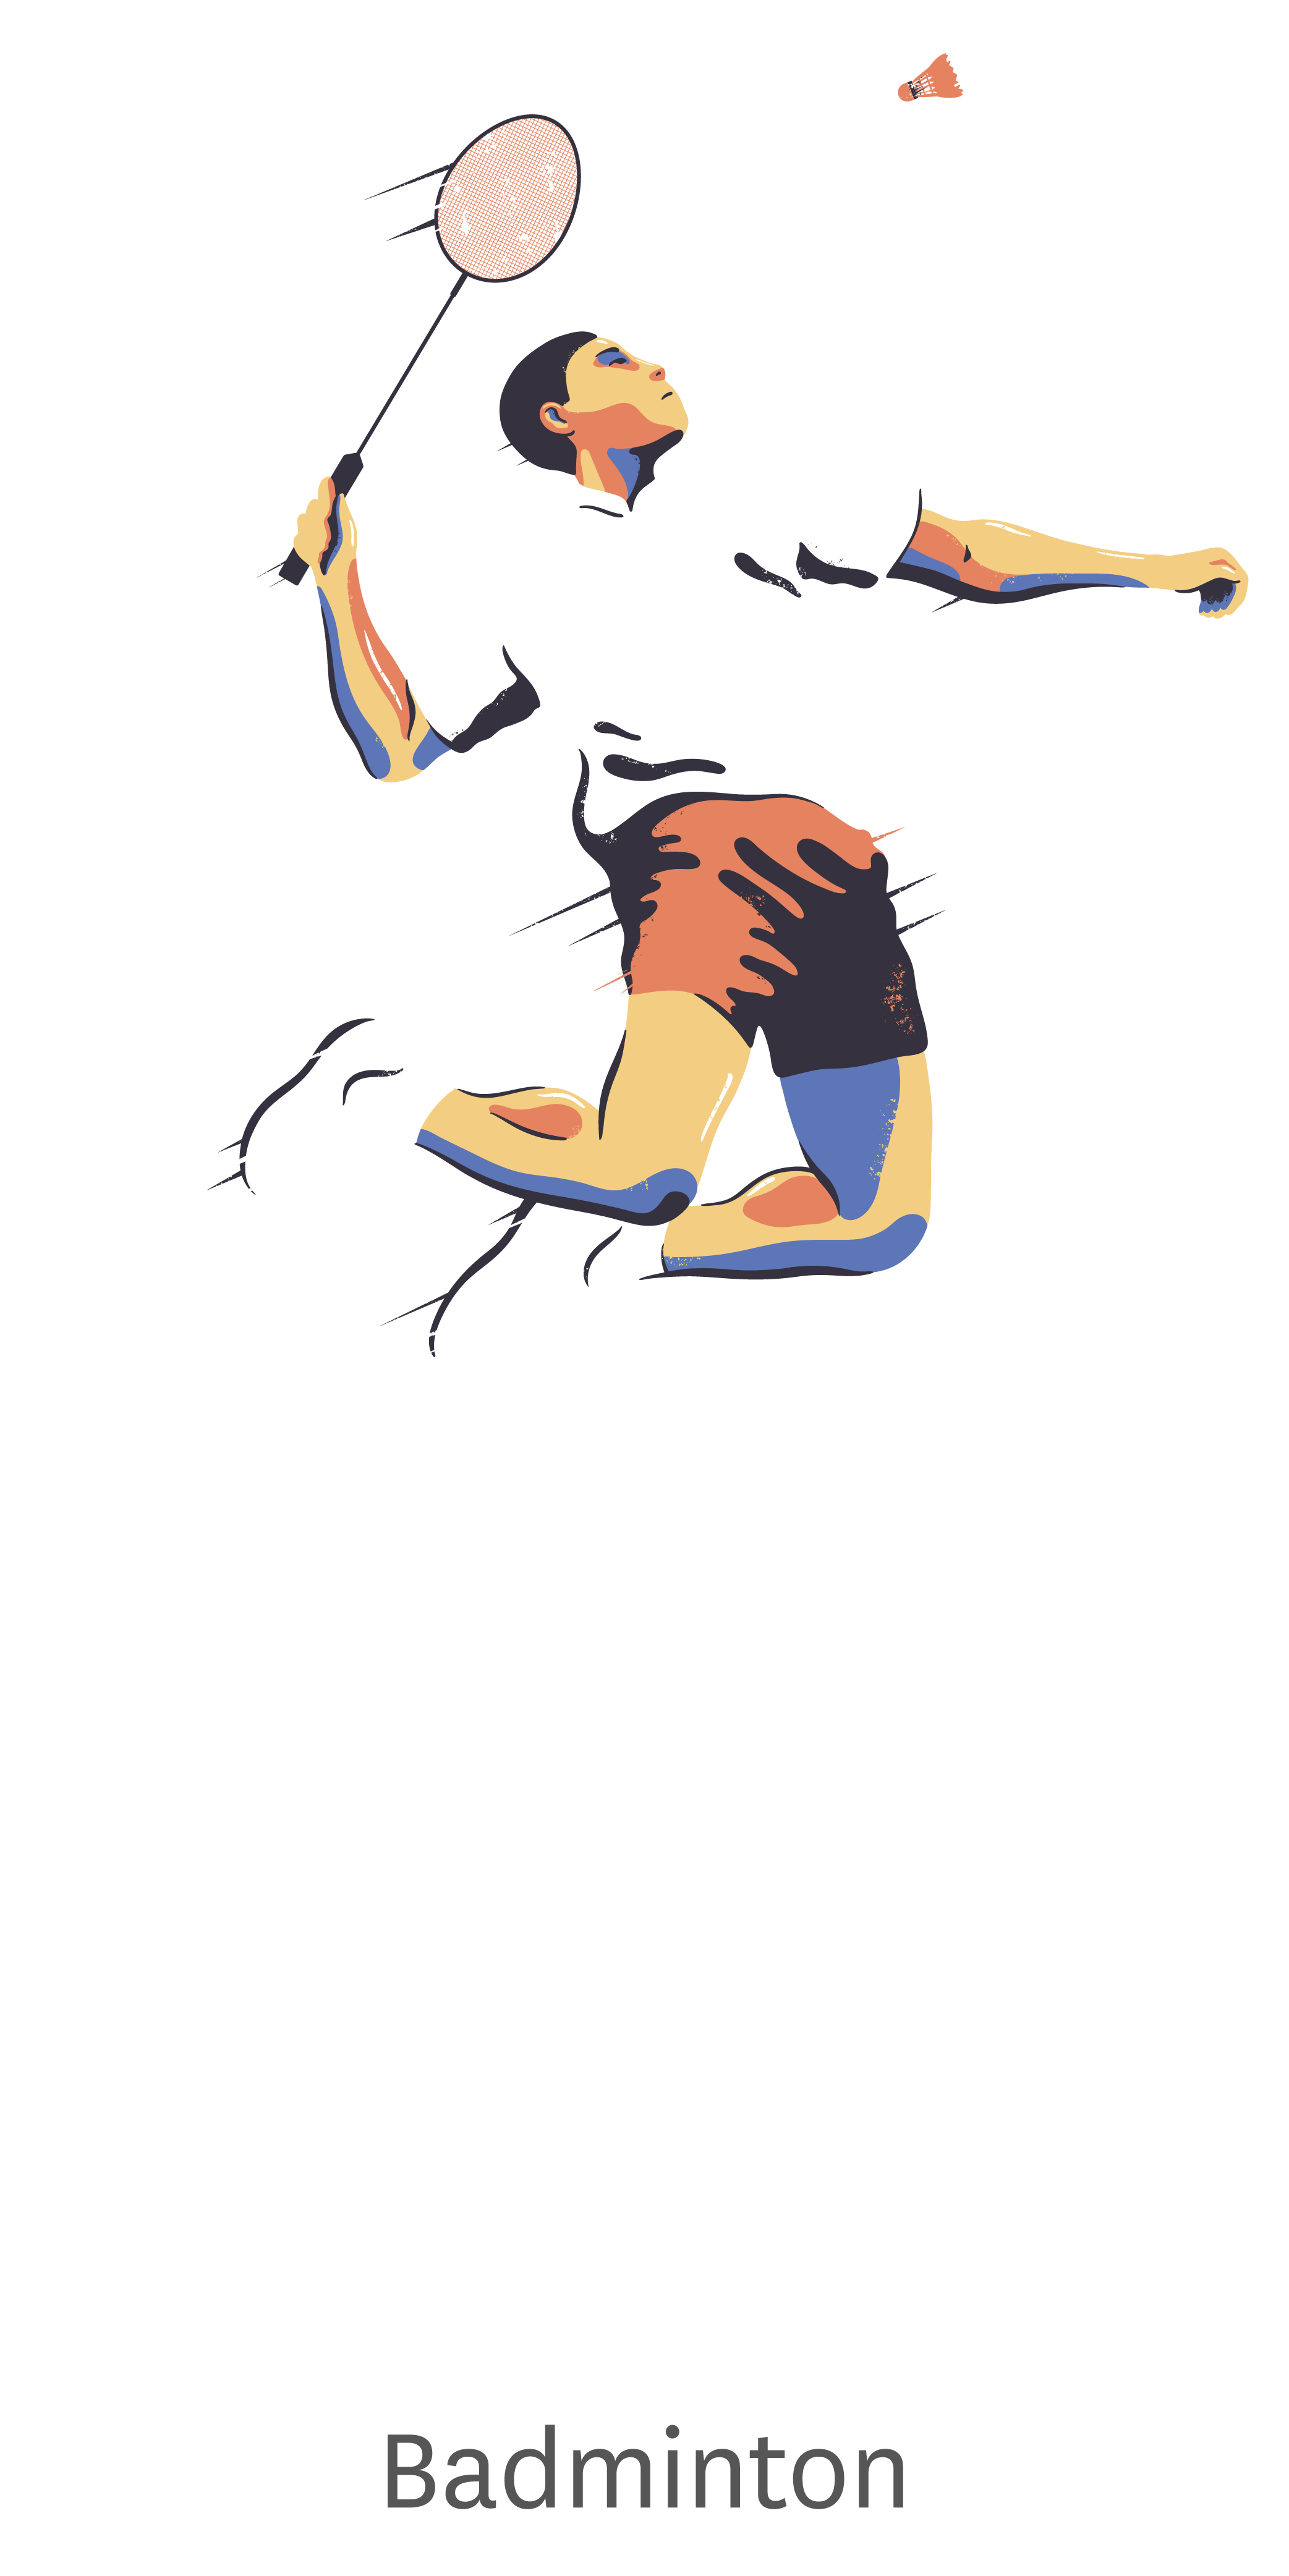 movement_sport_badminton.png